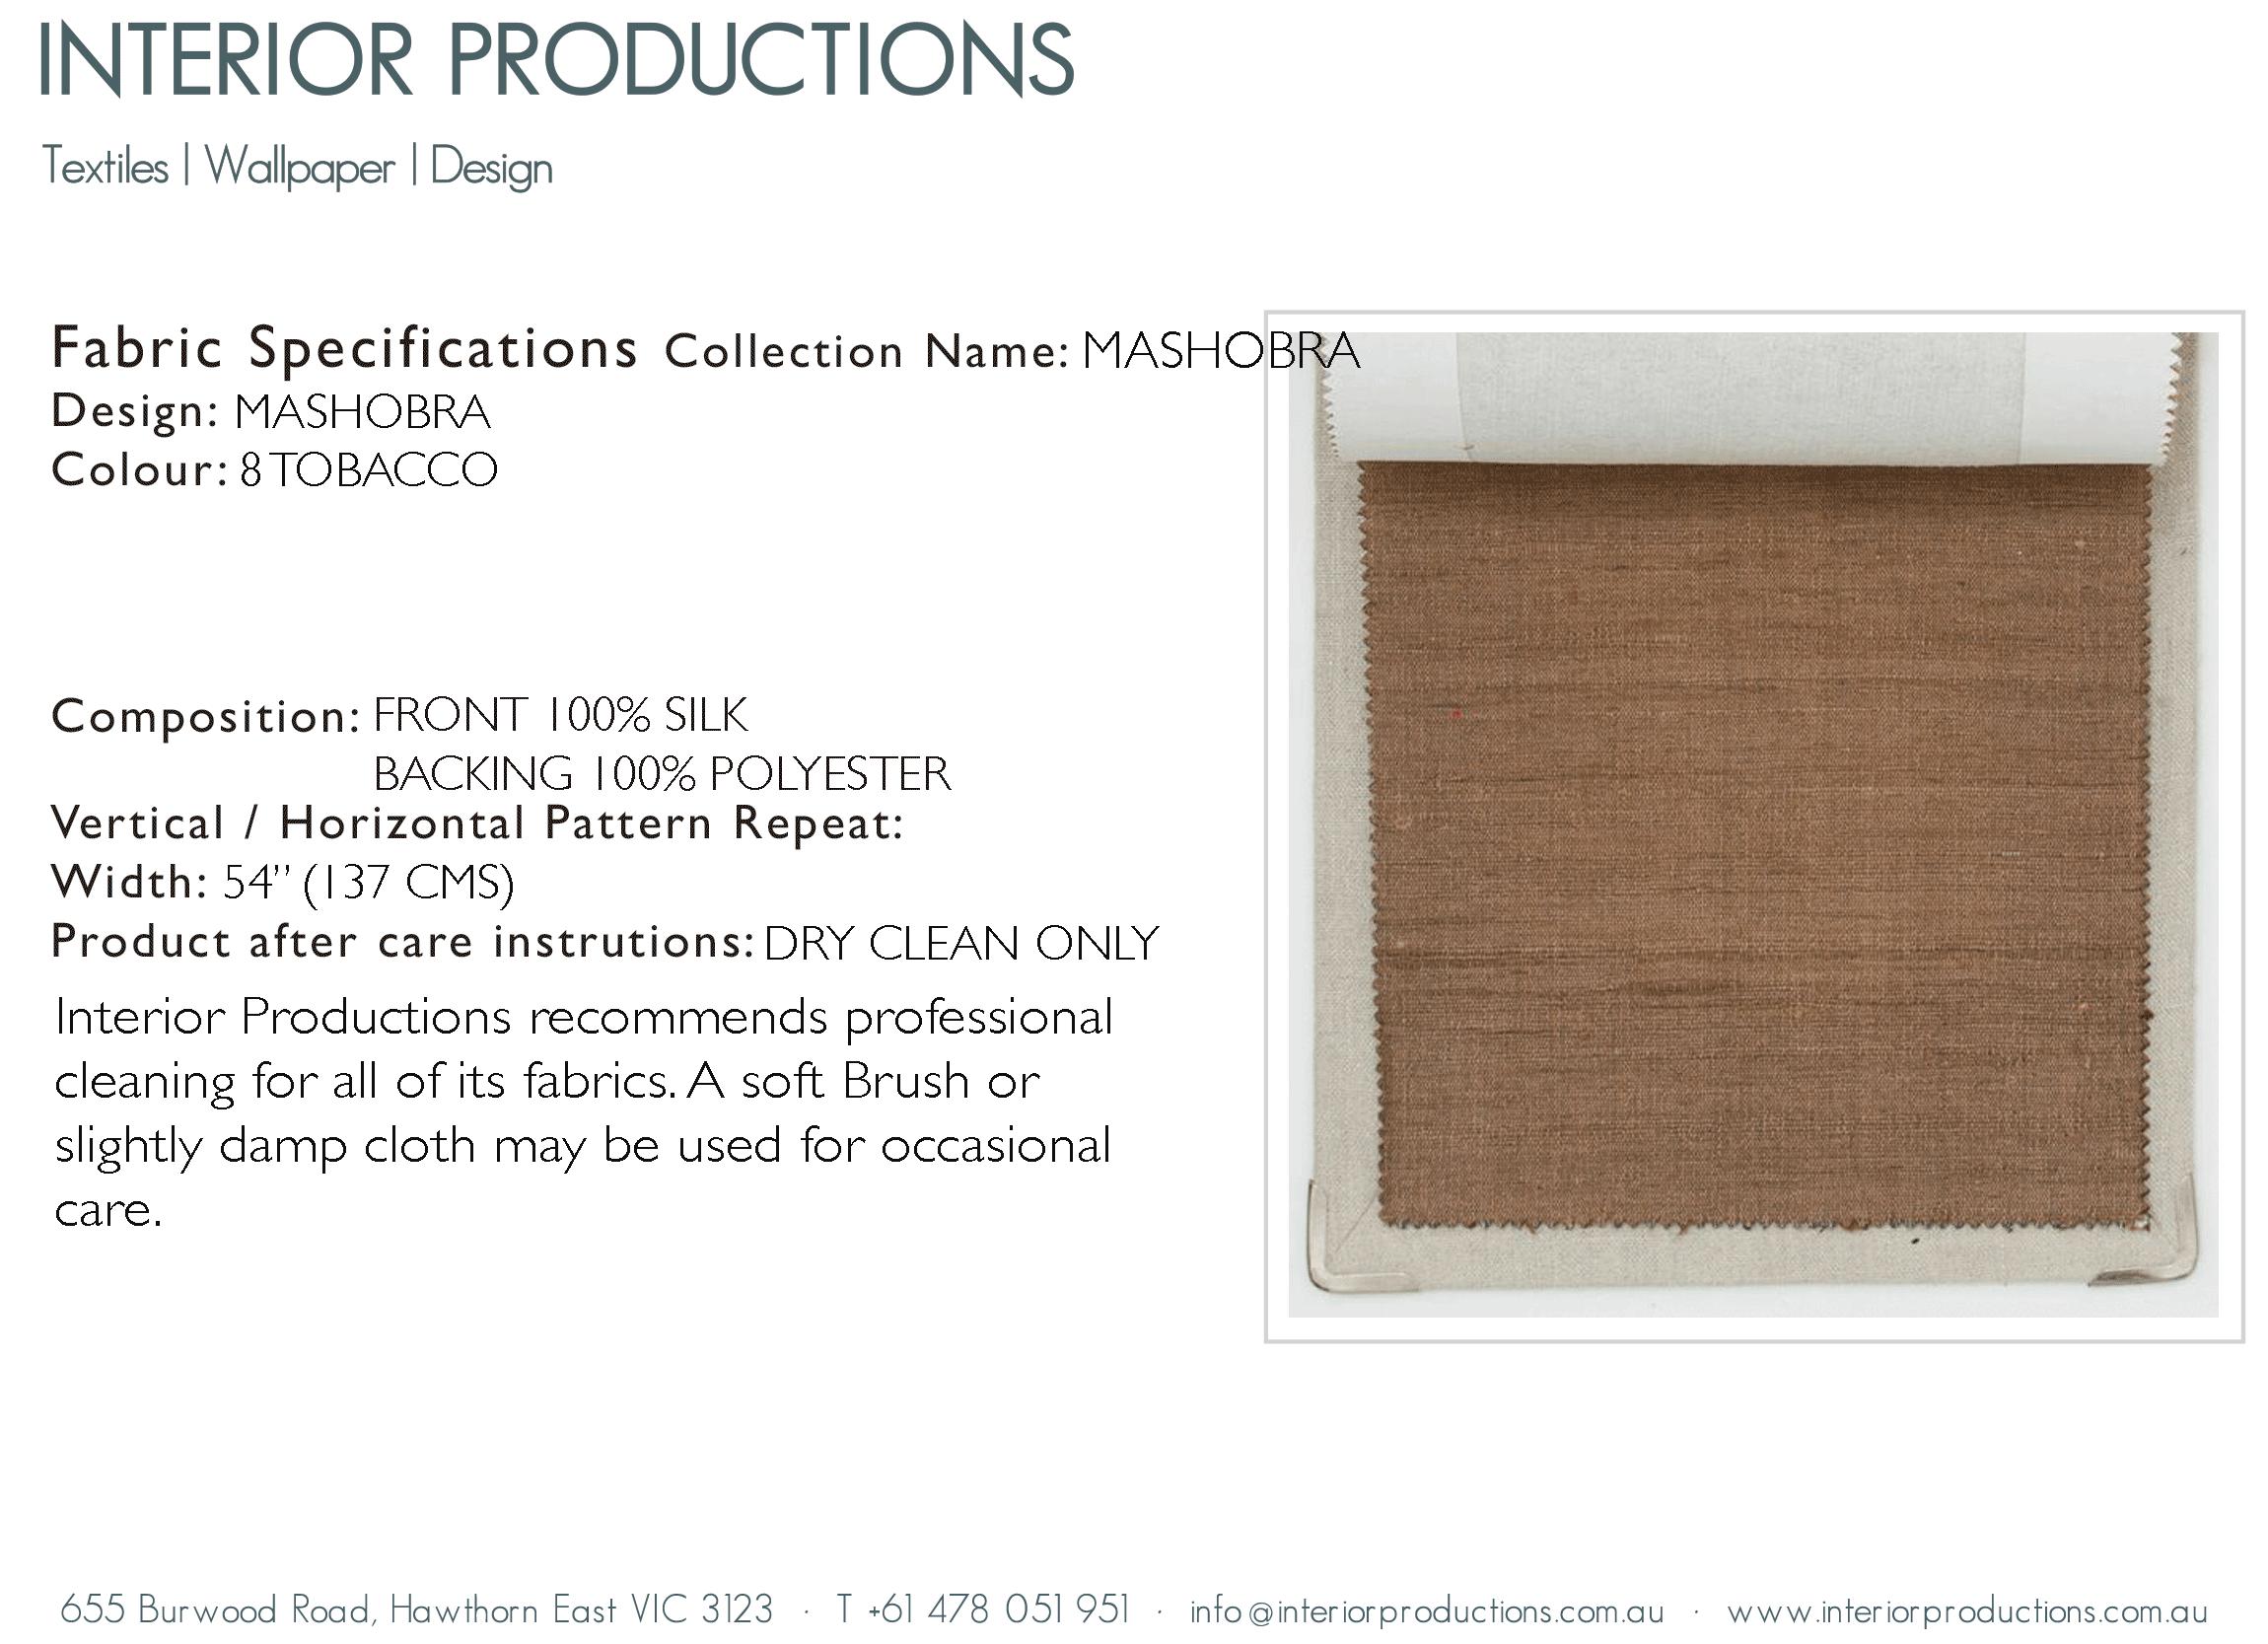 interior_productions_MASHOBRA---8-TOBACCO